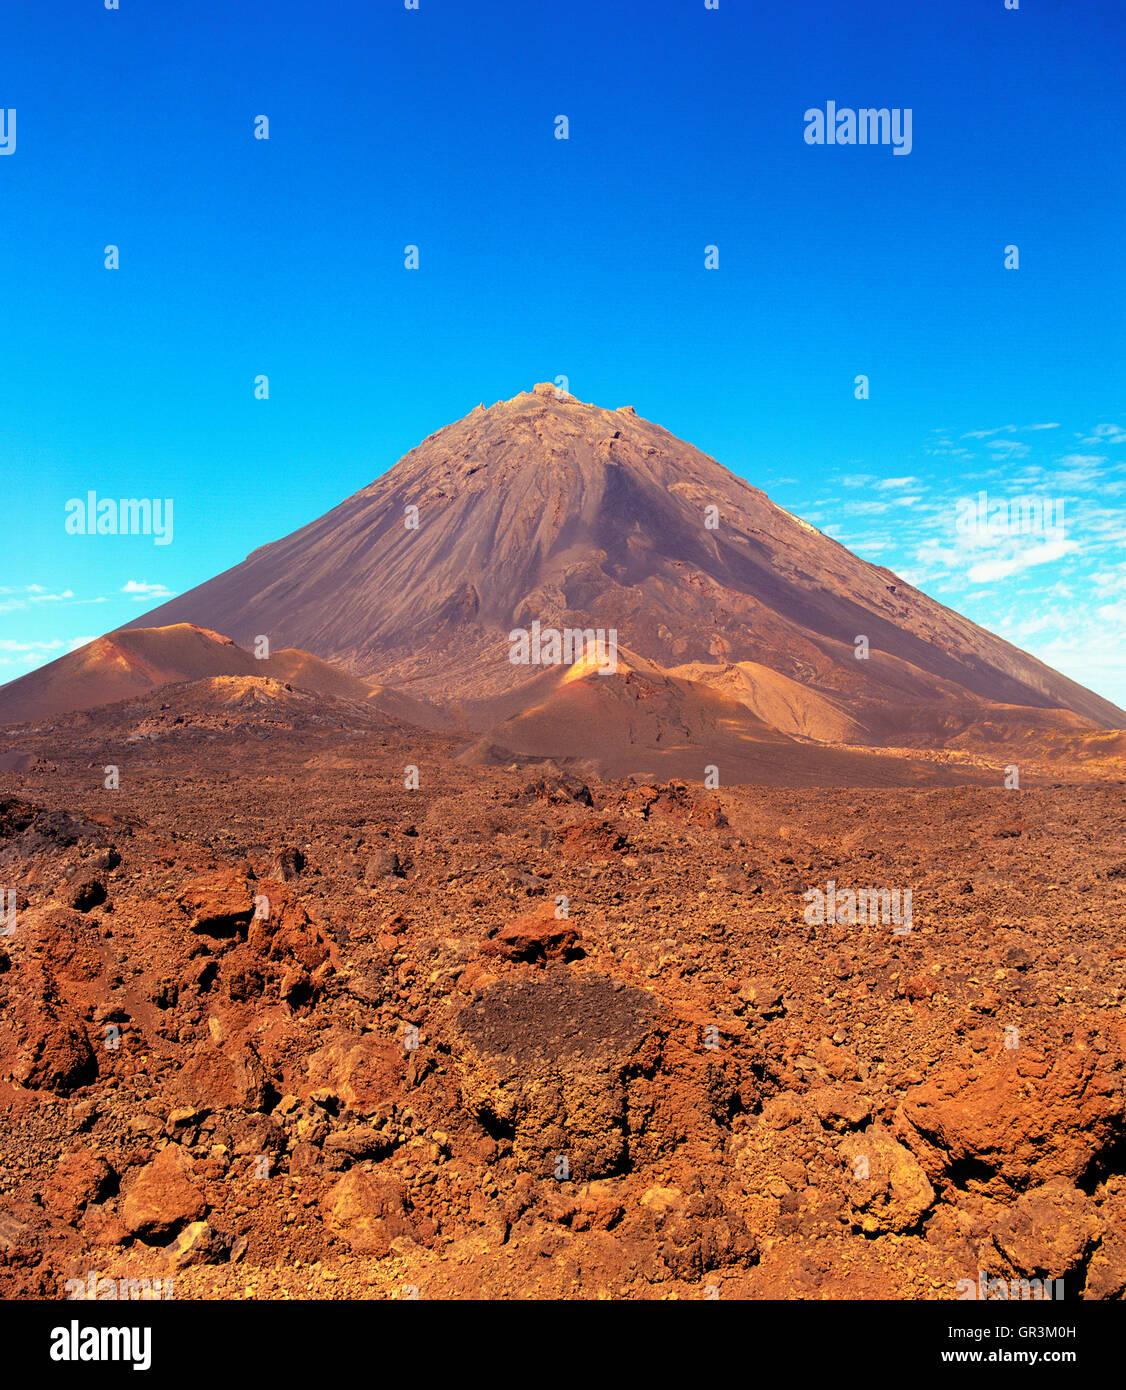 Pico de Fogo. Fogo, Isole di Capo Verde, Africa. Immagini Stock